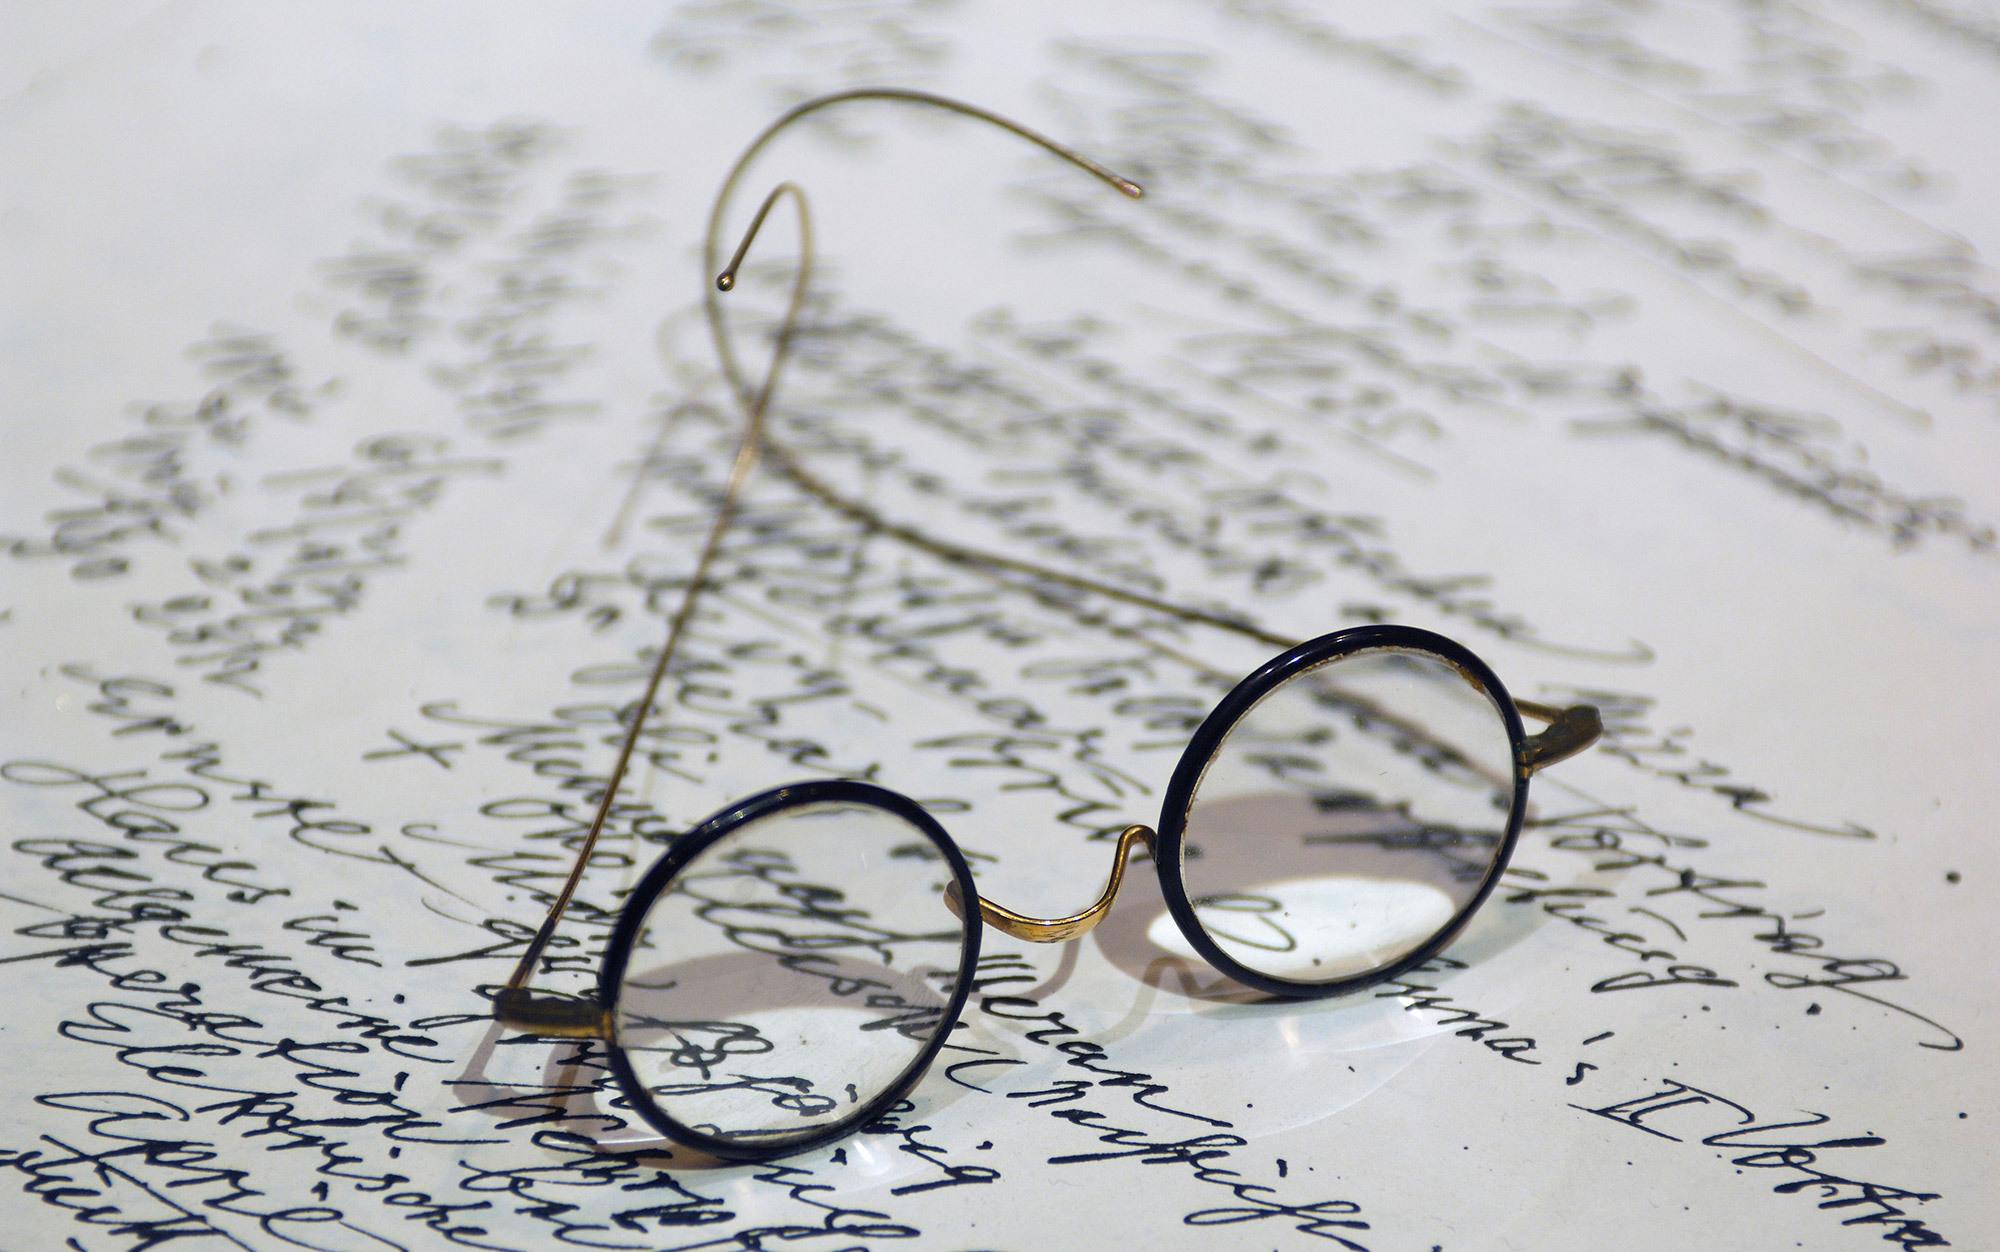 Resultado de imagem para Freud's glasses at the Freud Museum, London. Photo by Dukas Presseagentur/Alamy